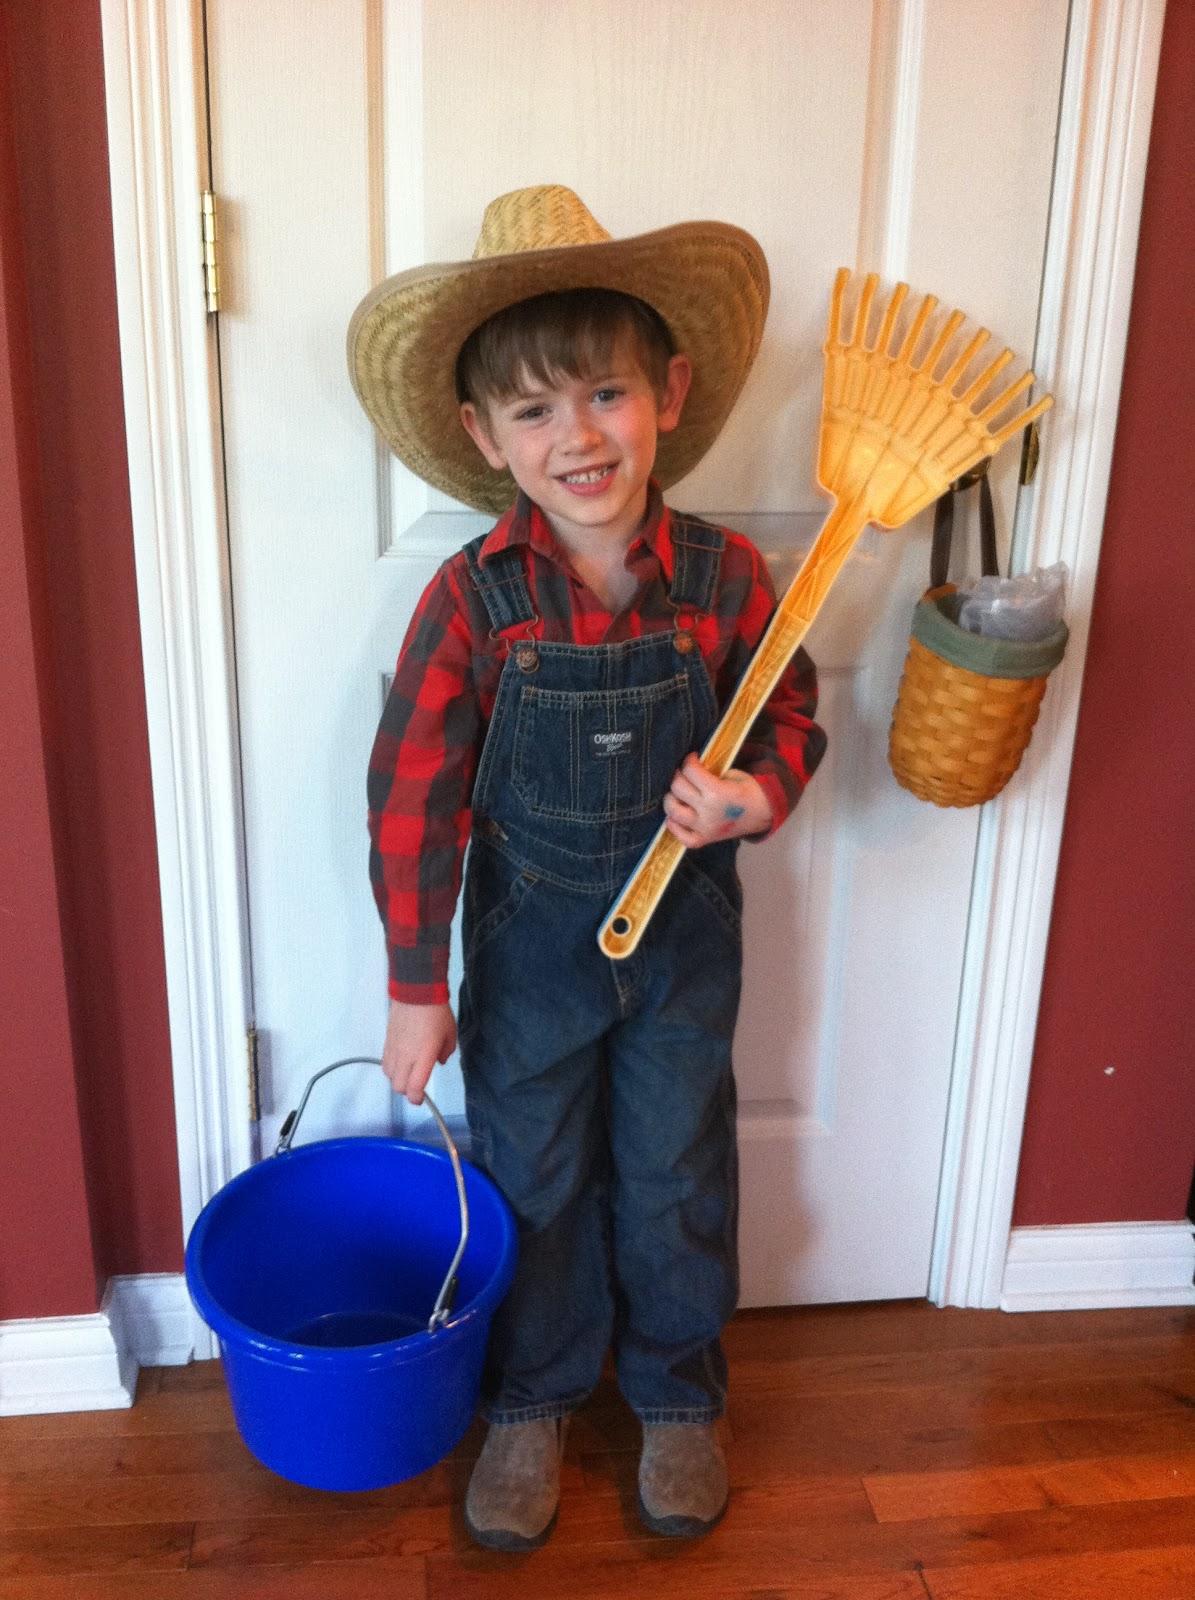 Awesome My Little Farmer Pictures - Joshkrajcik.us - joshkrajcik.us